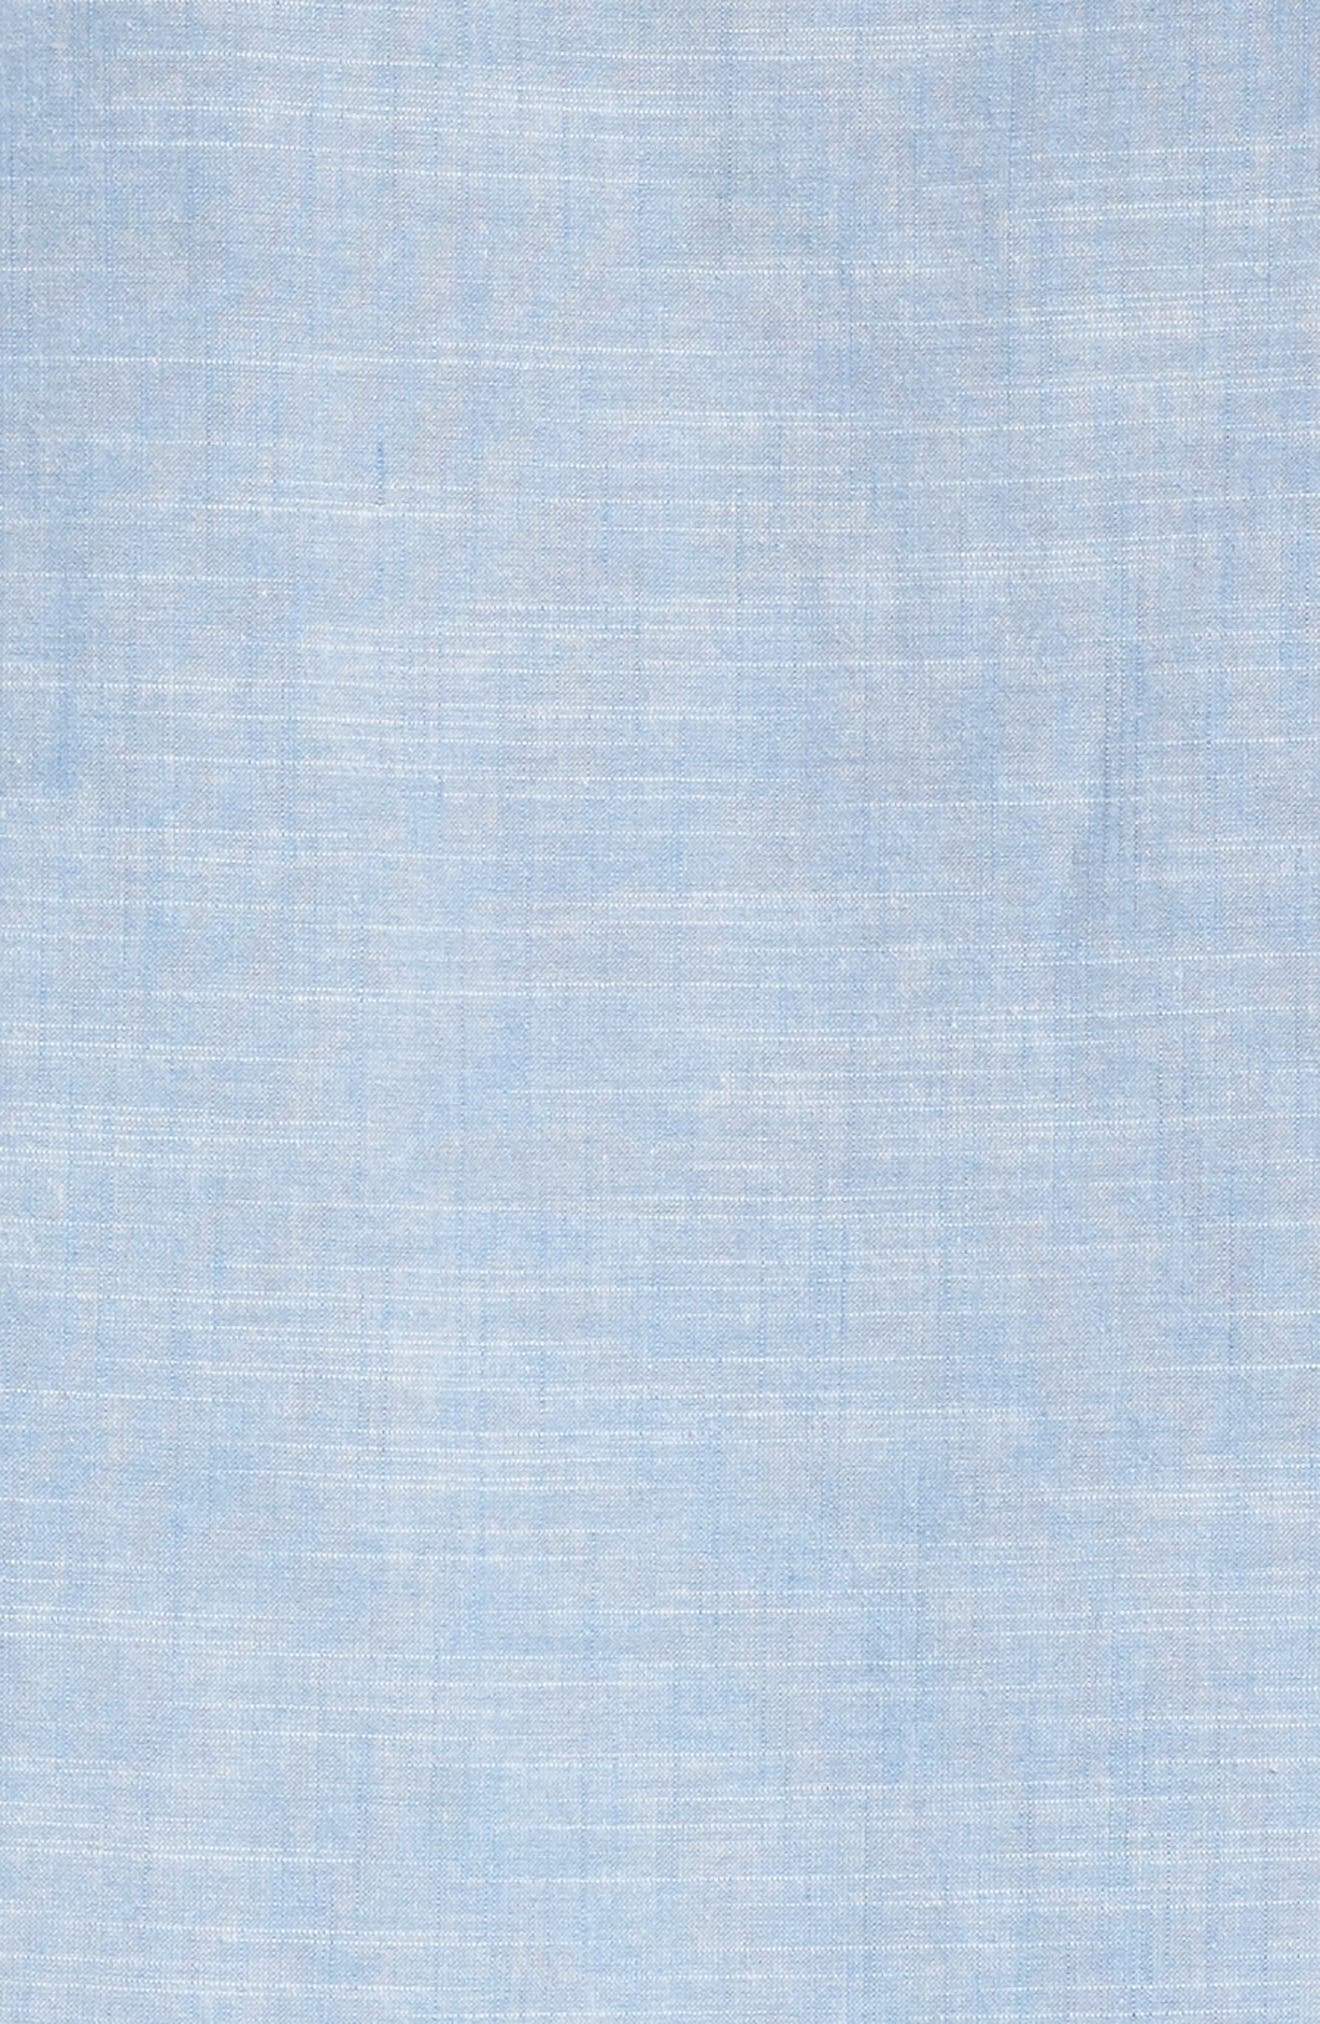 Jude Pajama Shorts,                             Alternate thumbnail 5, color,                             458